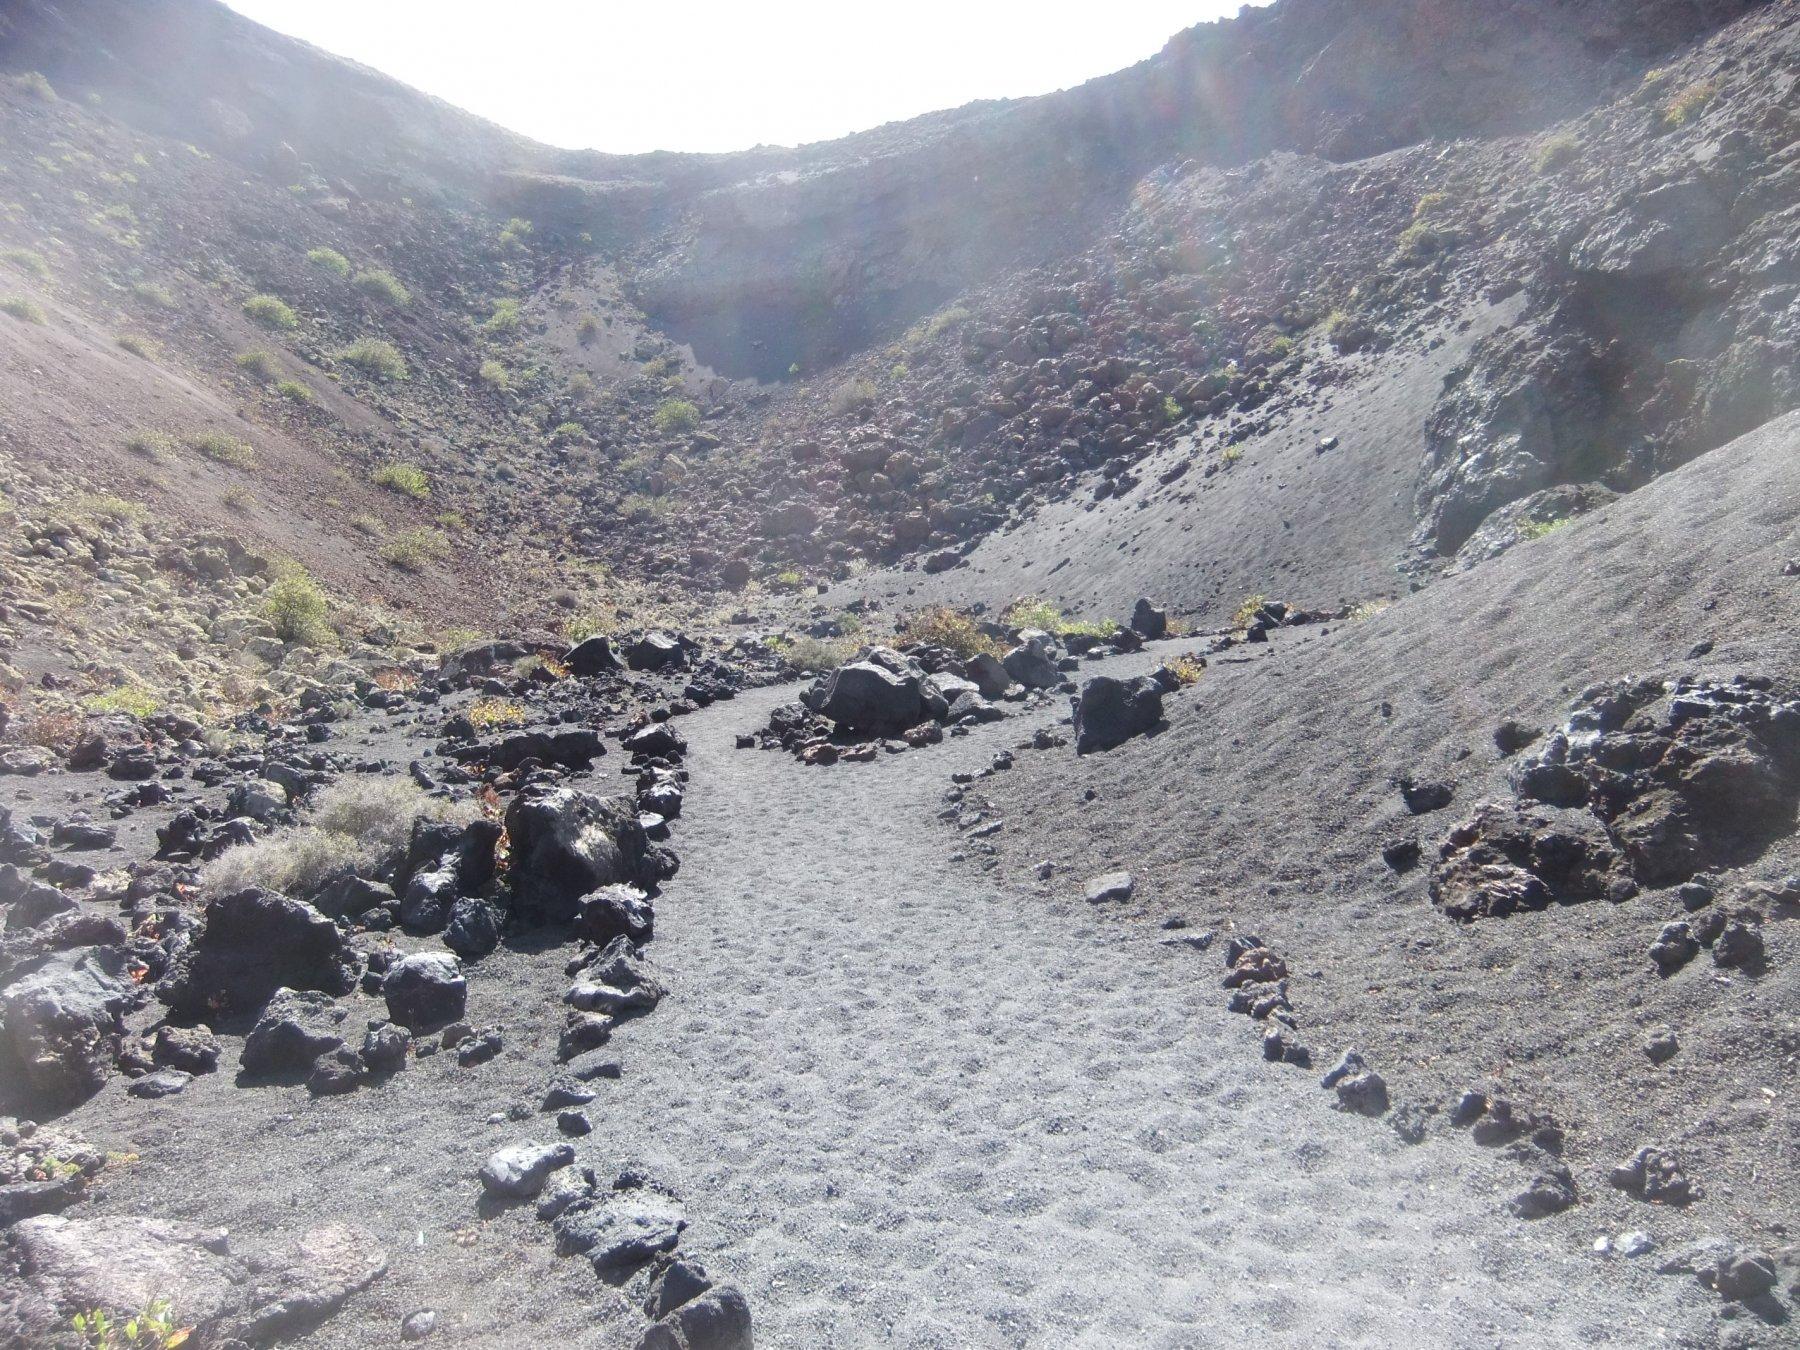 Lanzarote escursioni varie 2018-07-12